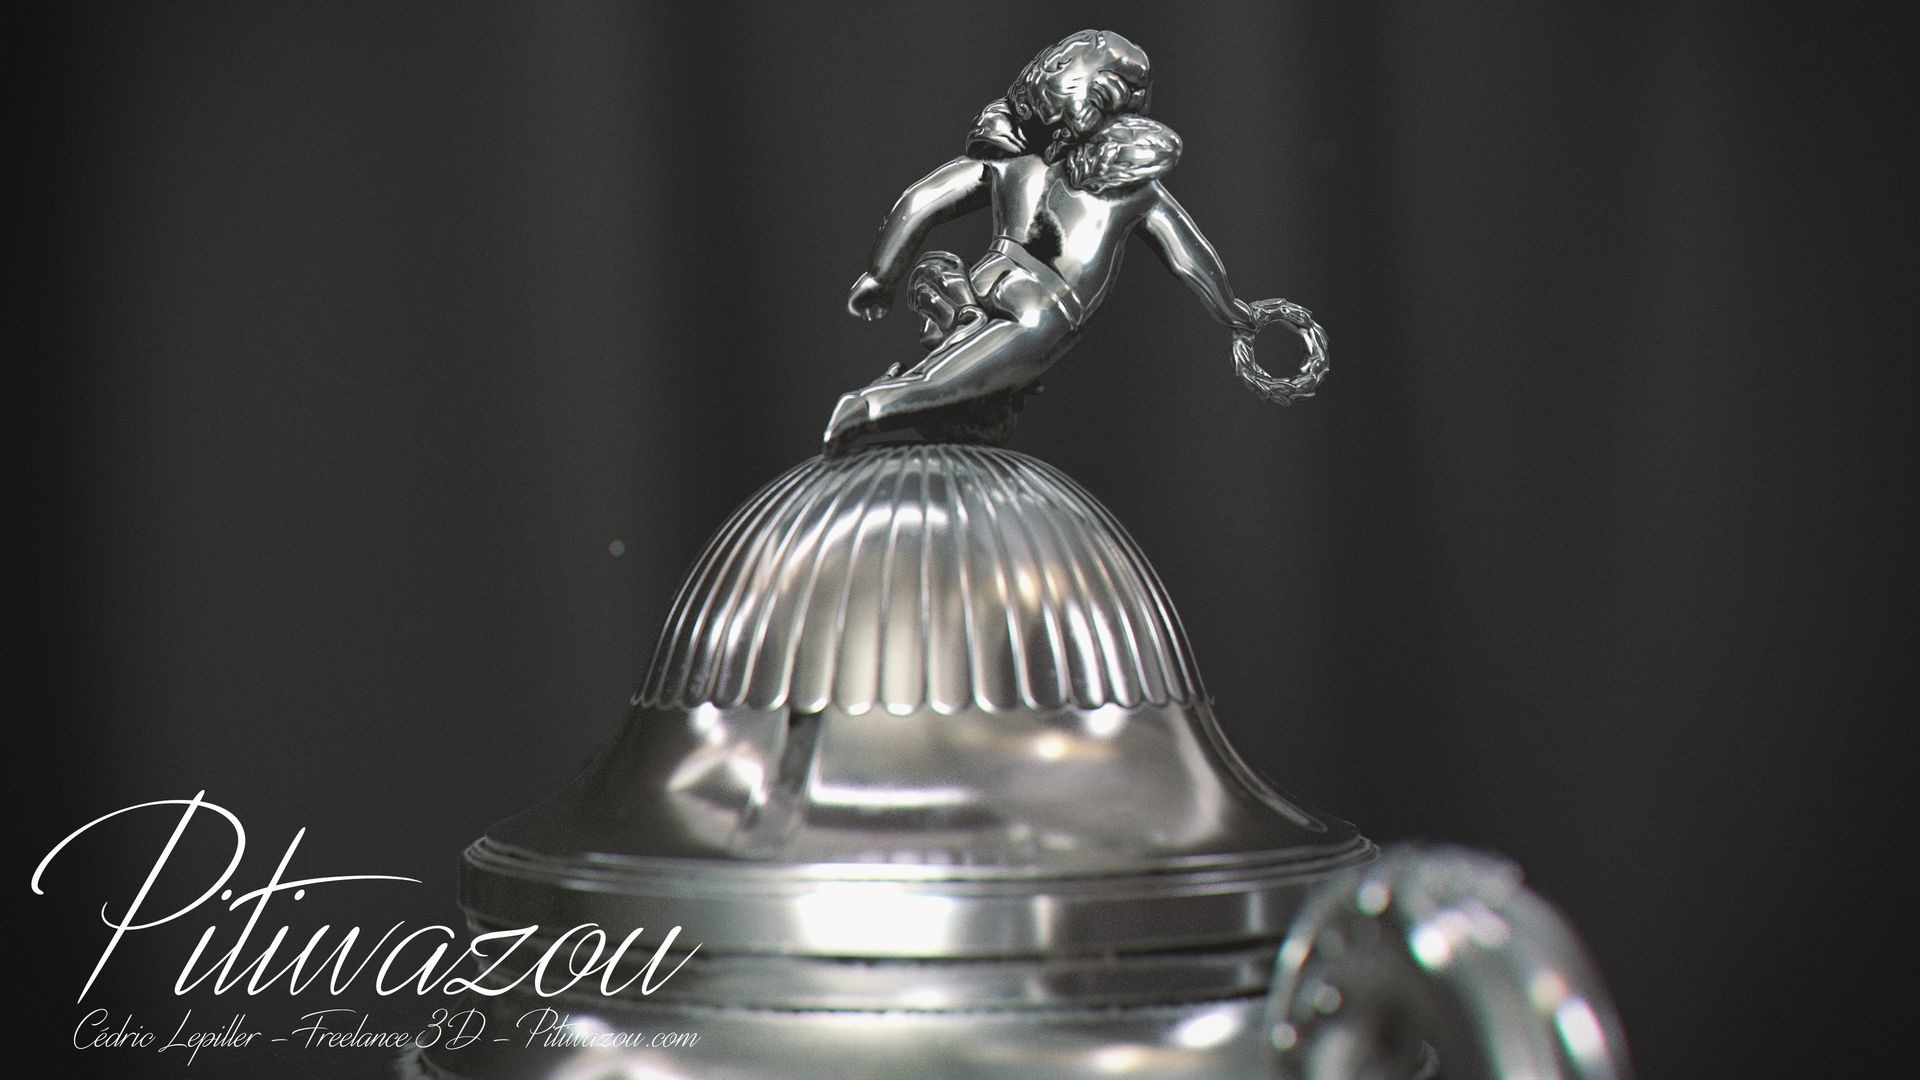 Cedric lepiller cedric lepiller freelance 3d pitiwazou coupe france eurosport 008 1920